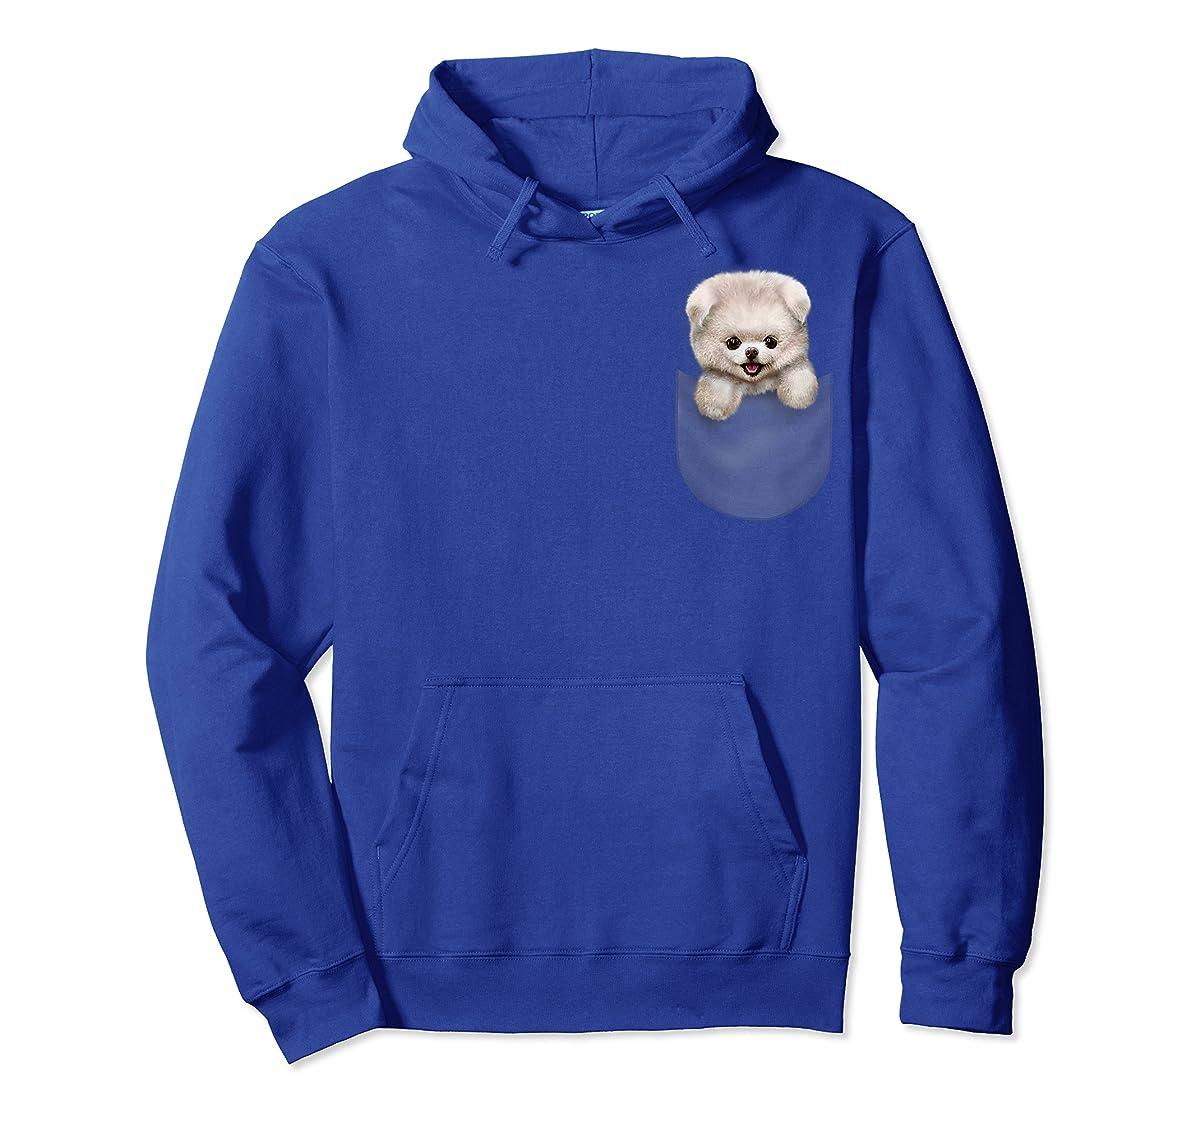 T-Shirt, Cute White Fluffy Pomeranian Puppy in Pocket, Dog-Hoodie-Royal